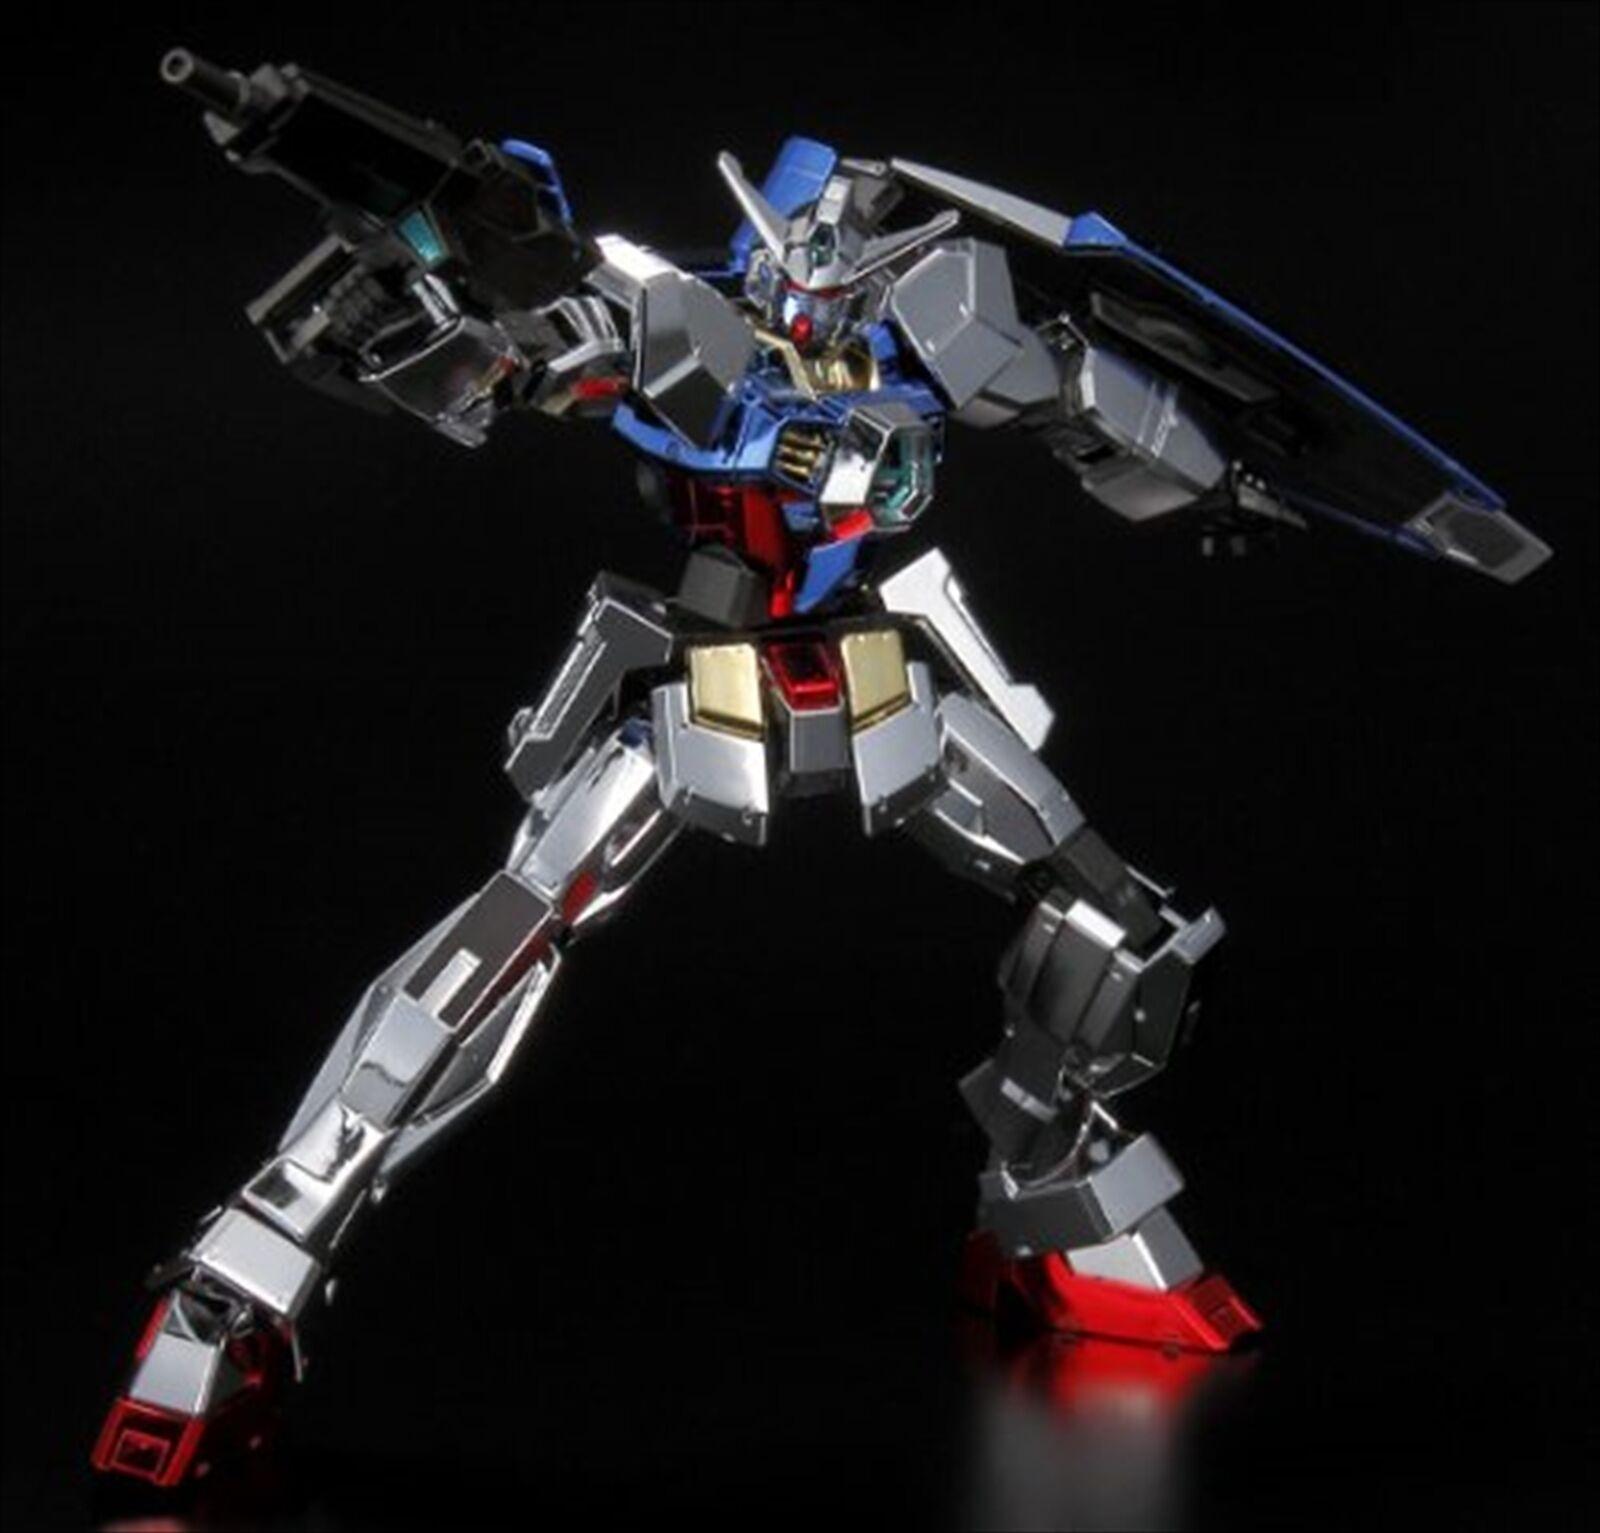 HG 1 144 Gundam AGE-1 Normal color Plated Ver. Gunpla Expo Limited Model Kit